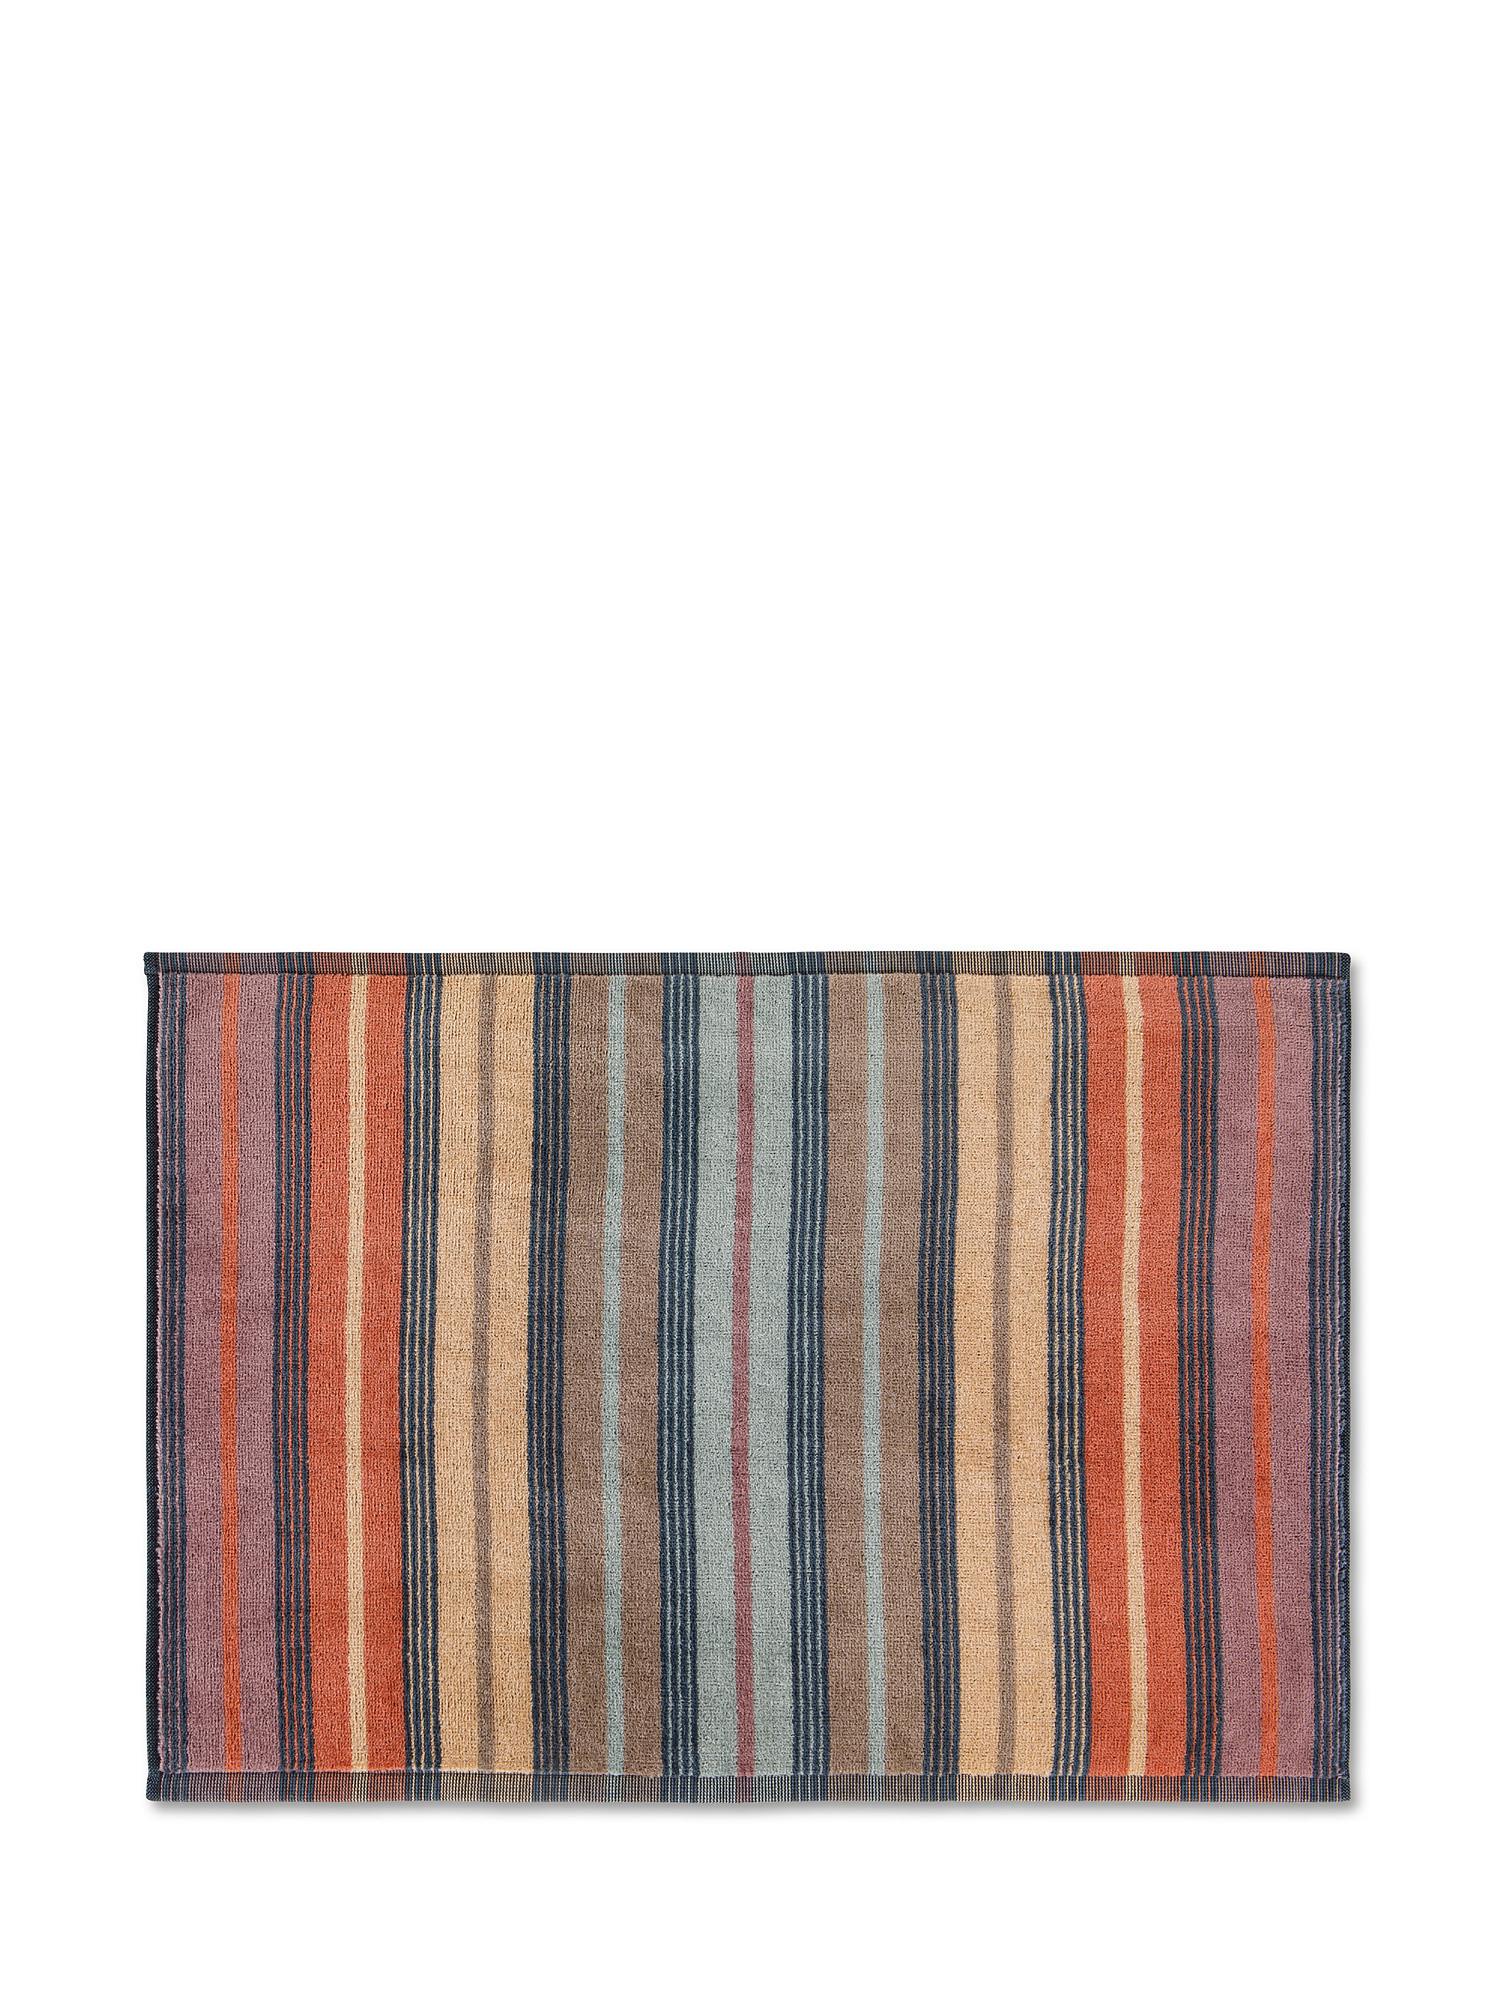 Asciugamano cotone velour motivo righe larghe, Multicolor, large image number 1